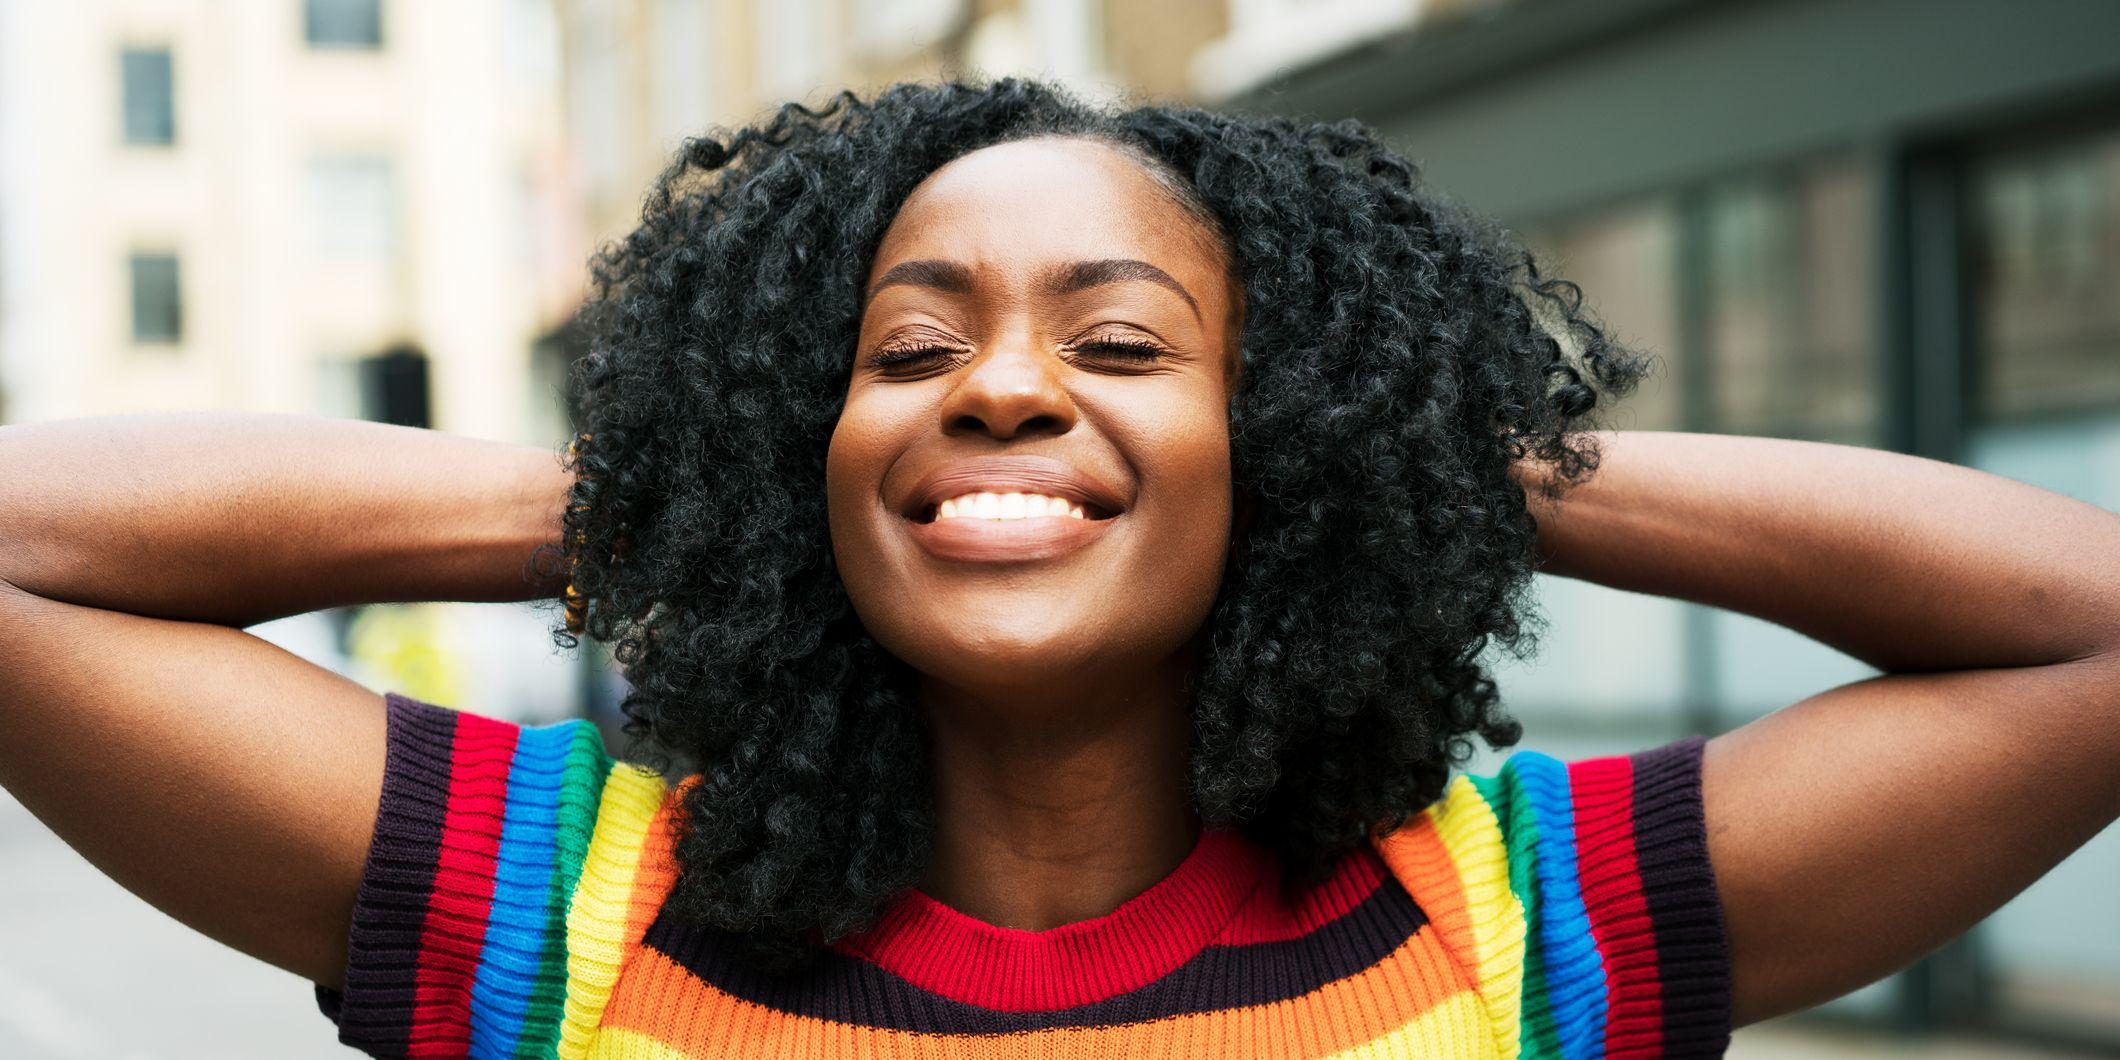 Lush new biodegradable face wipe - Women's Health UK